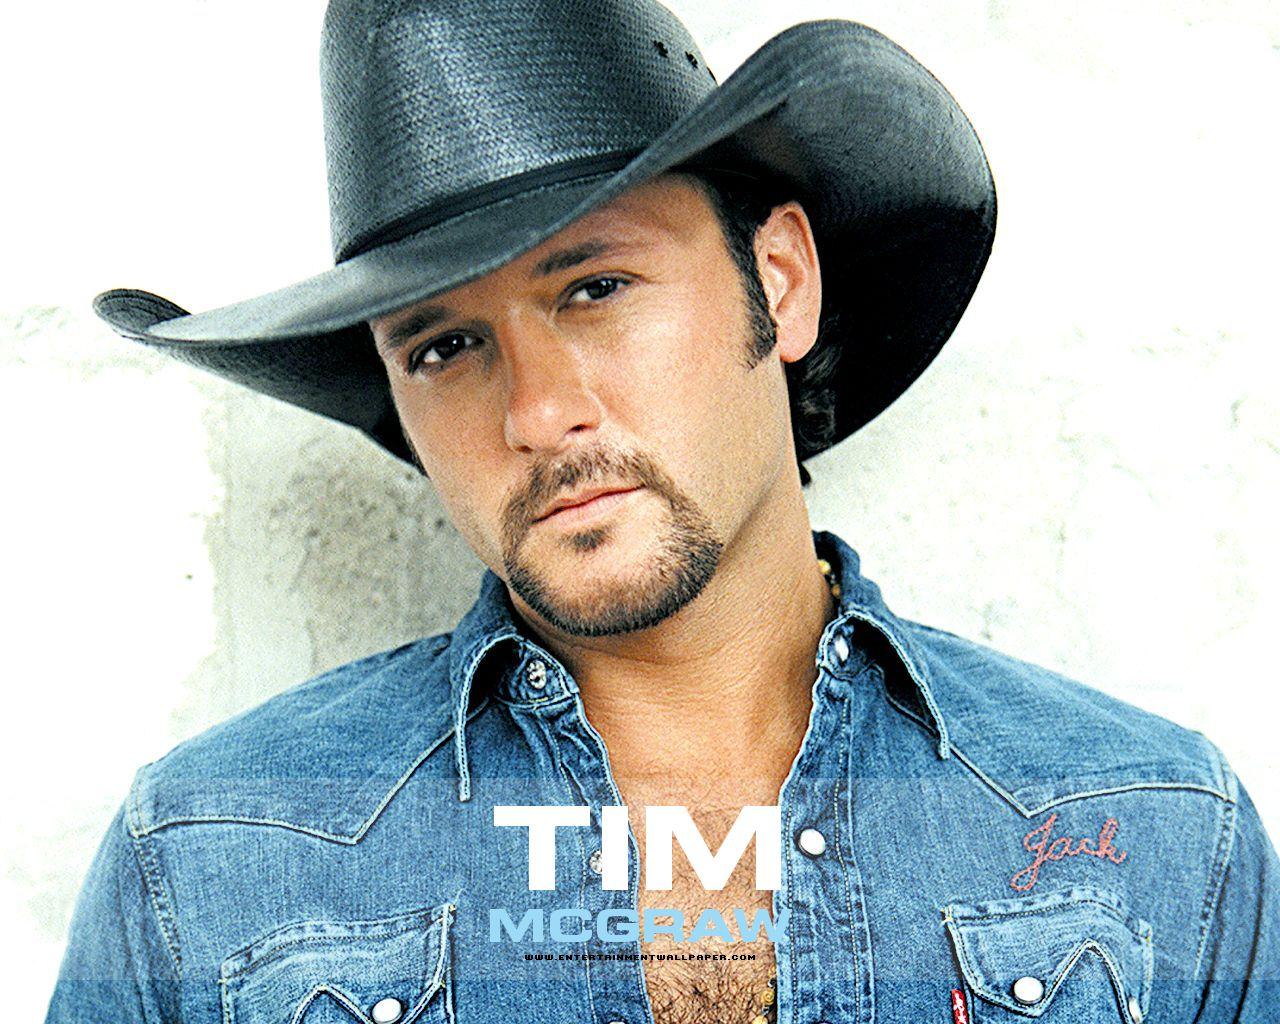 Tim McGraw Wallpaper   40009616 1280x1024 Desktop Download page 1280x1024